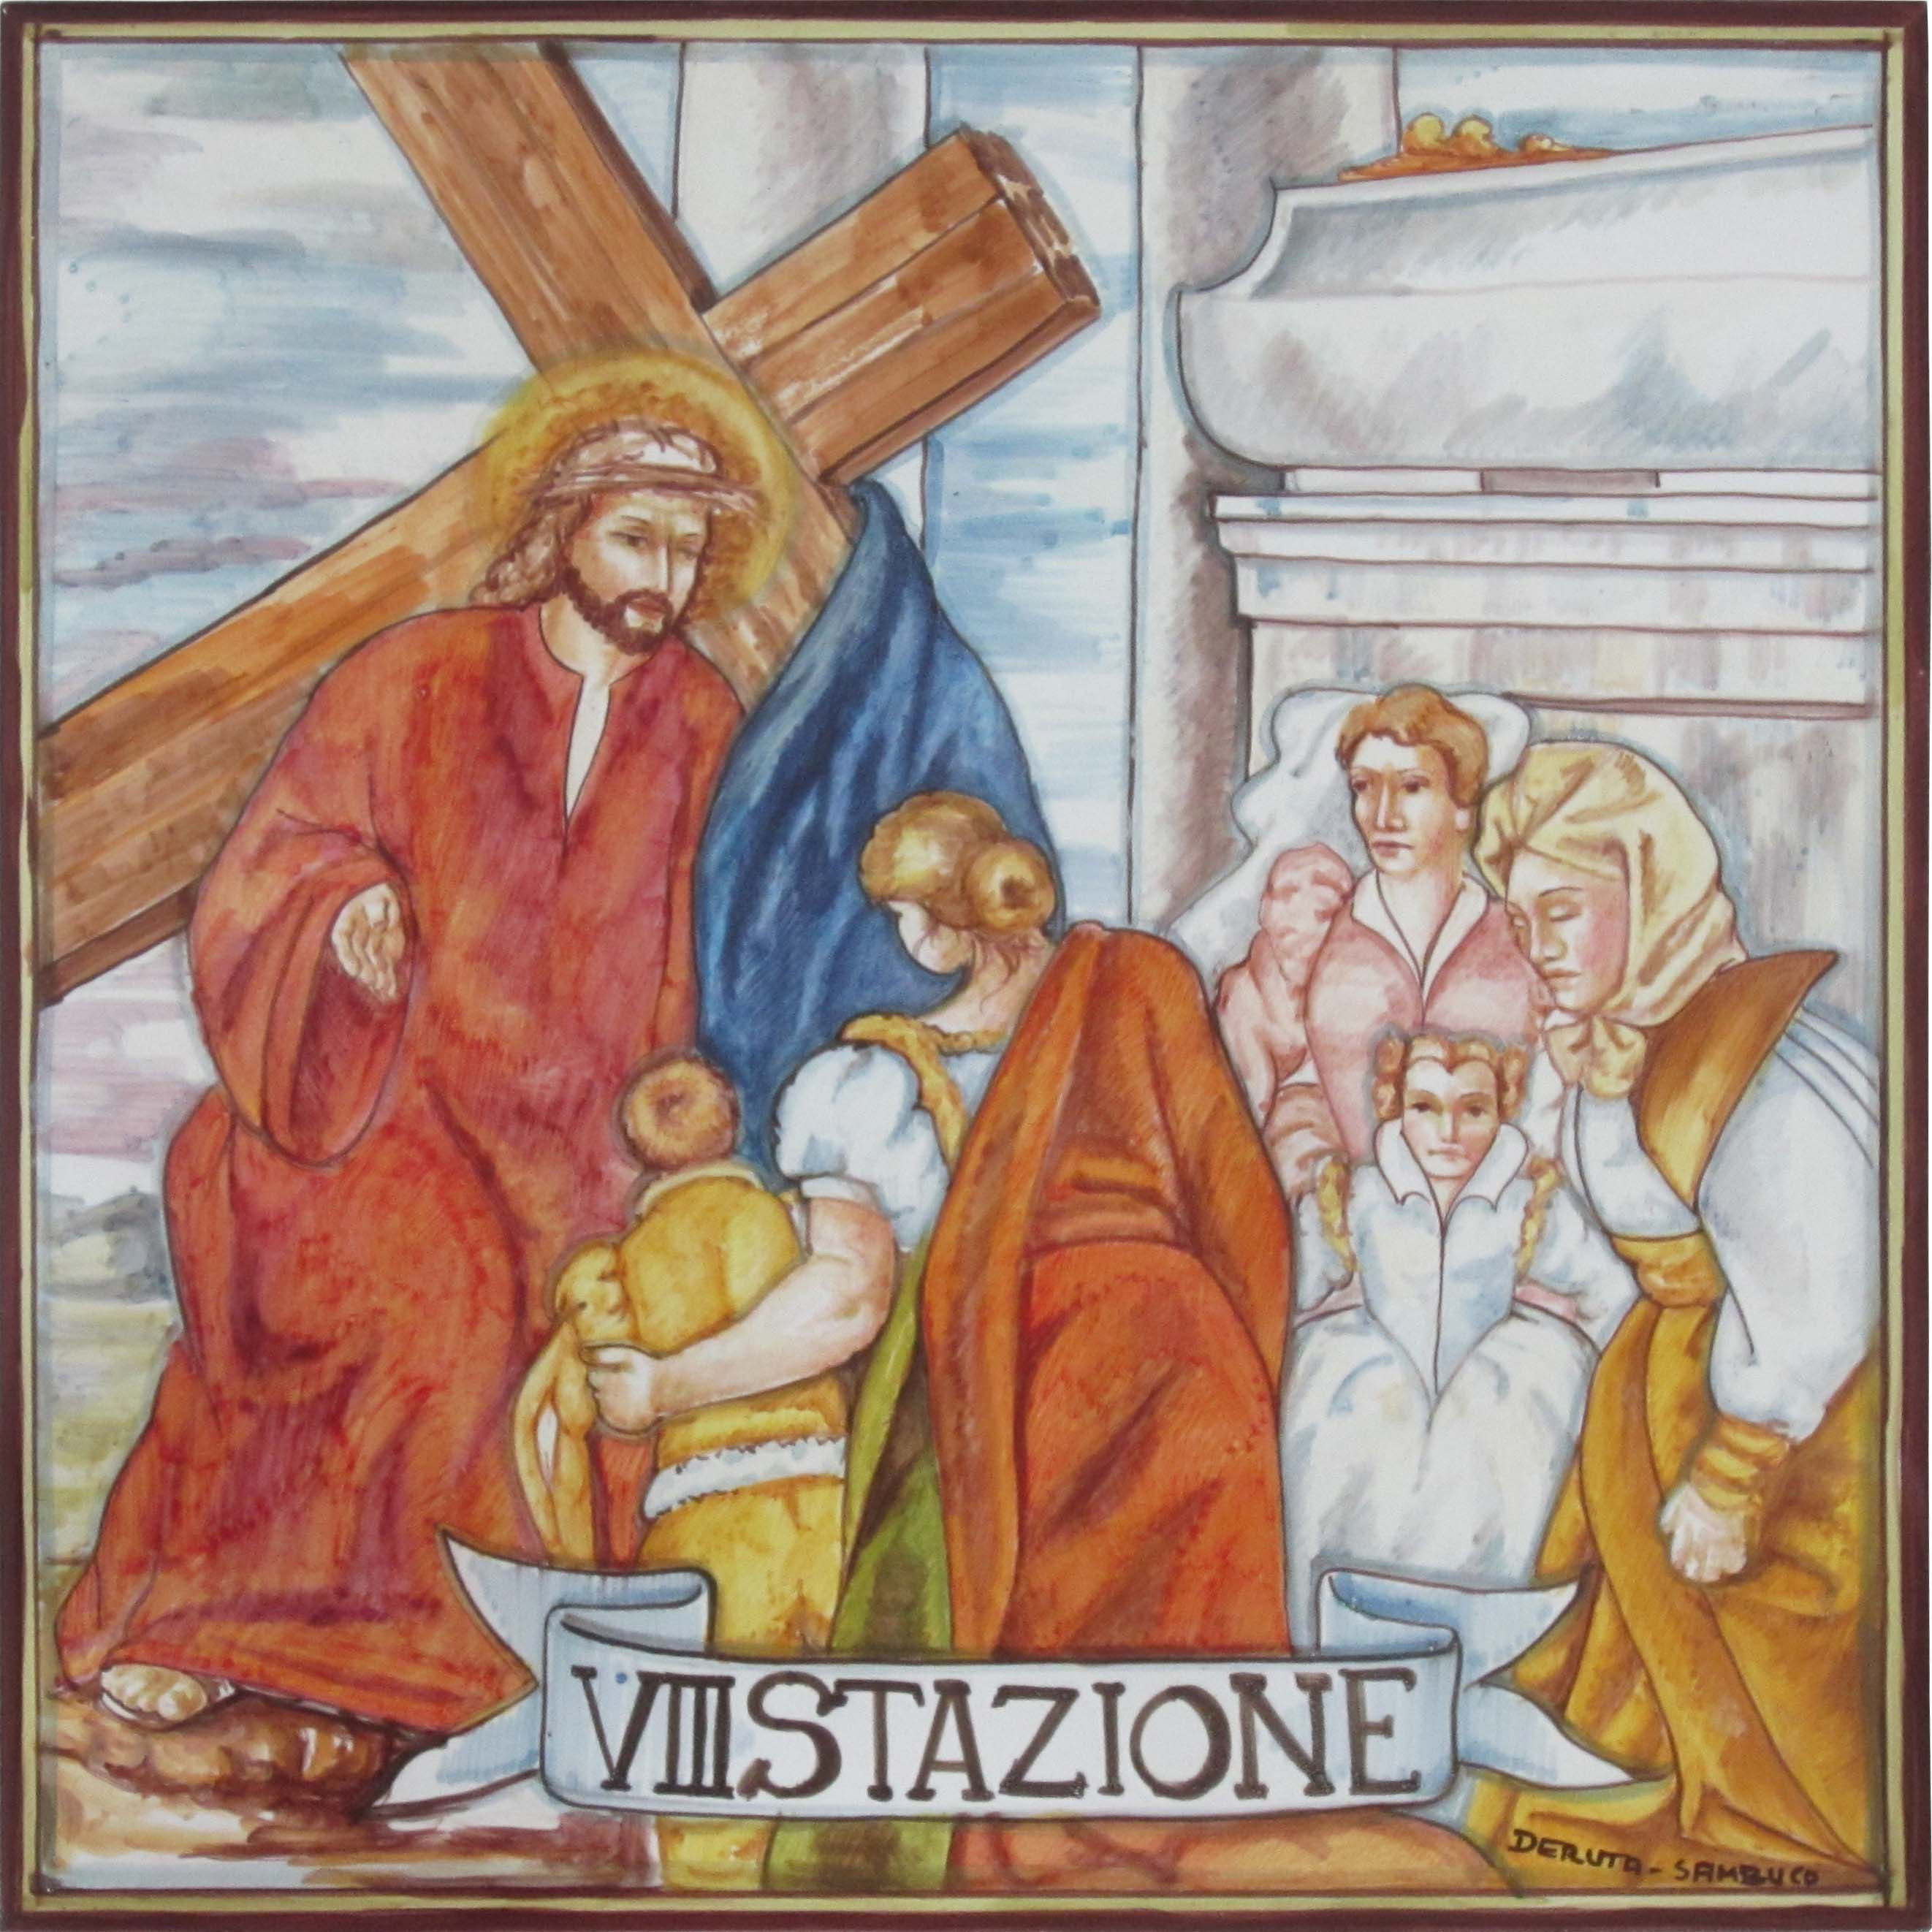 Sambuco Arte Sacra Deruta Via Crucis Stations of the Cross 02